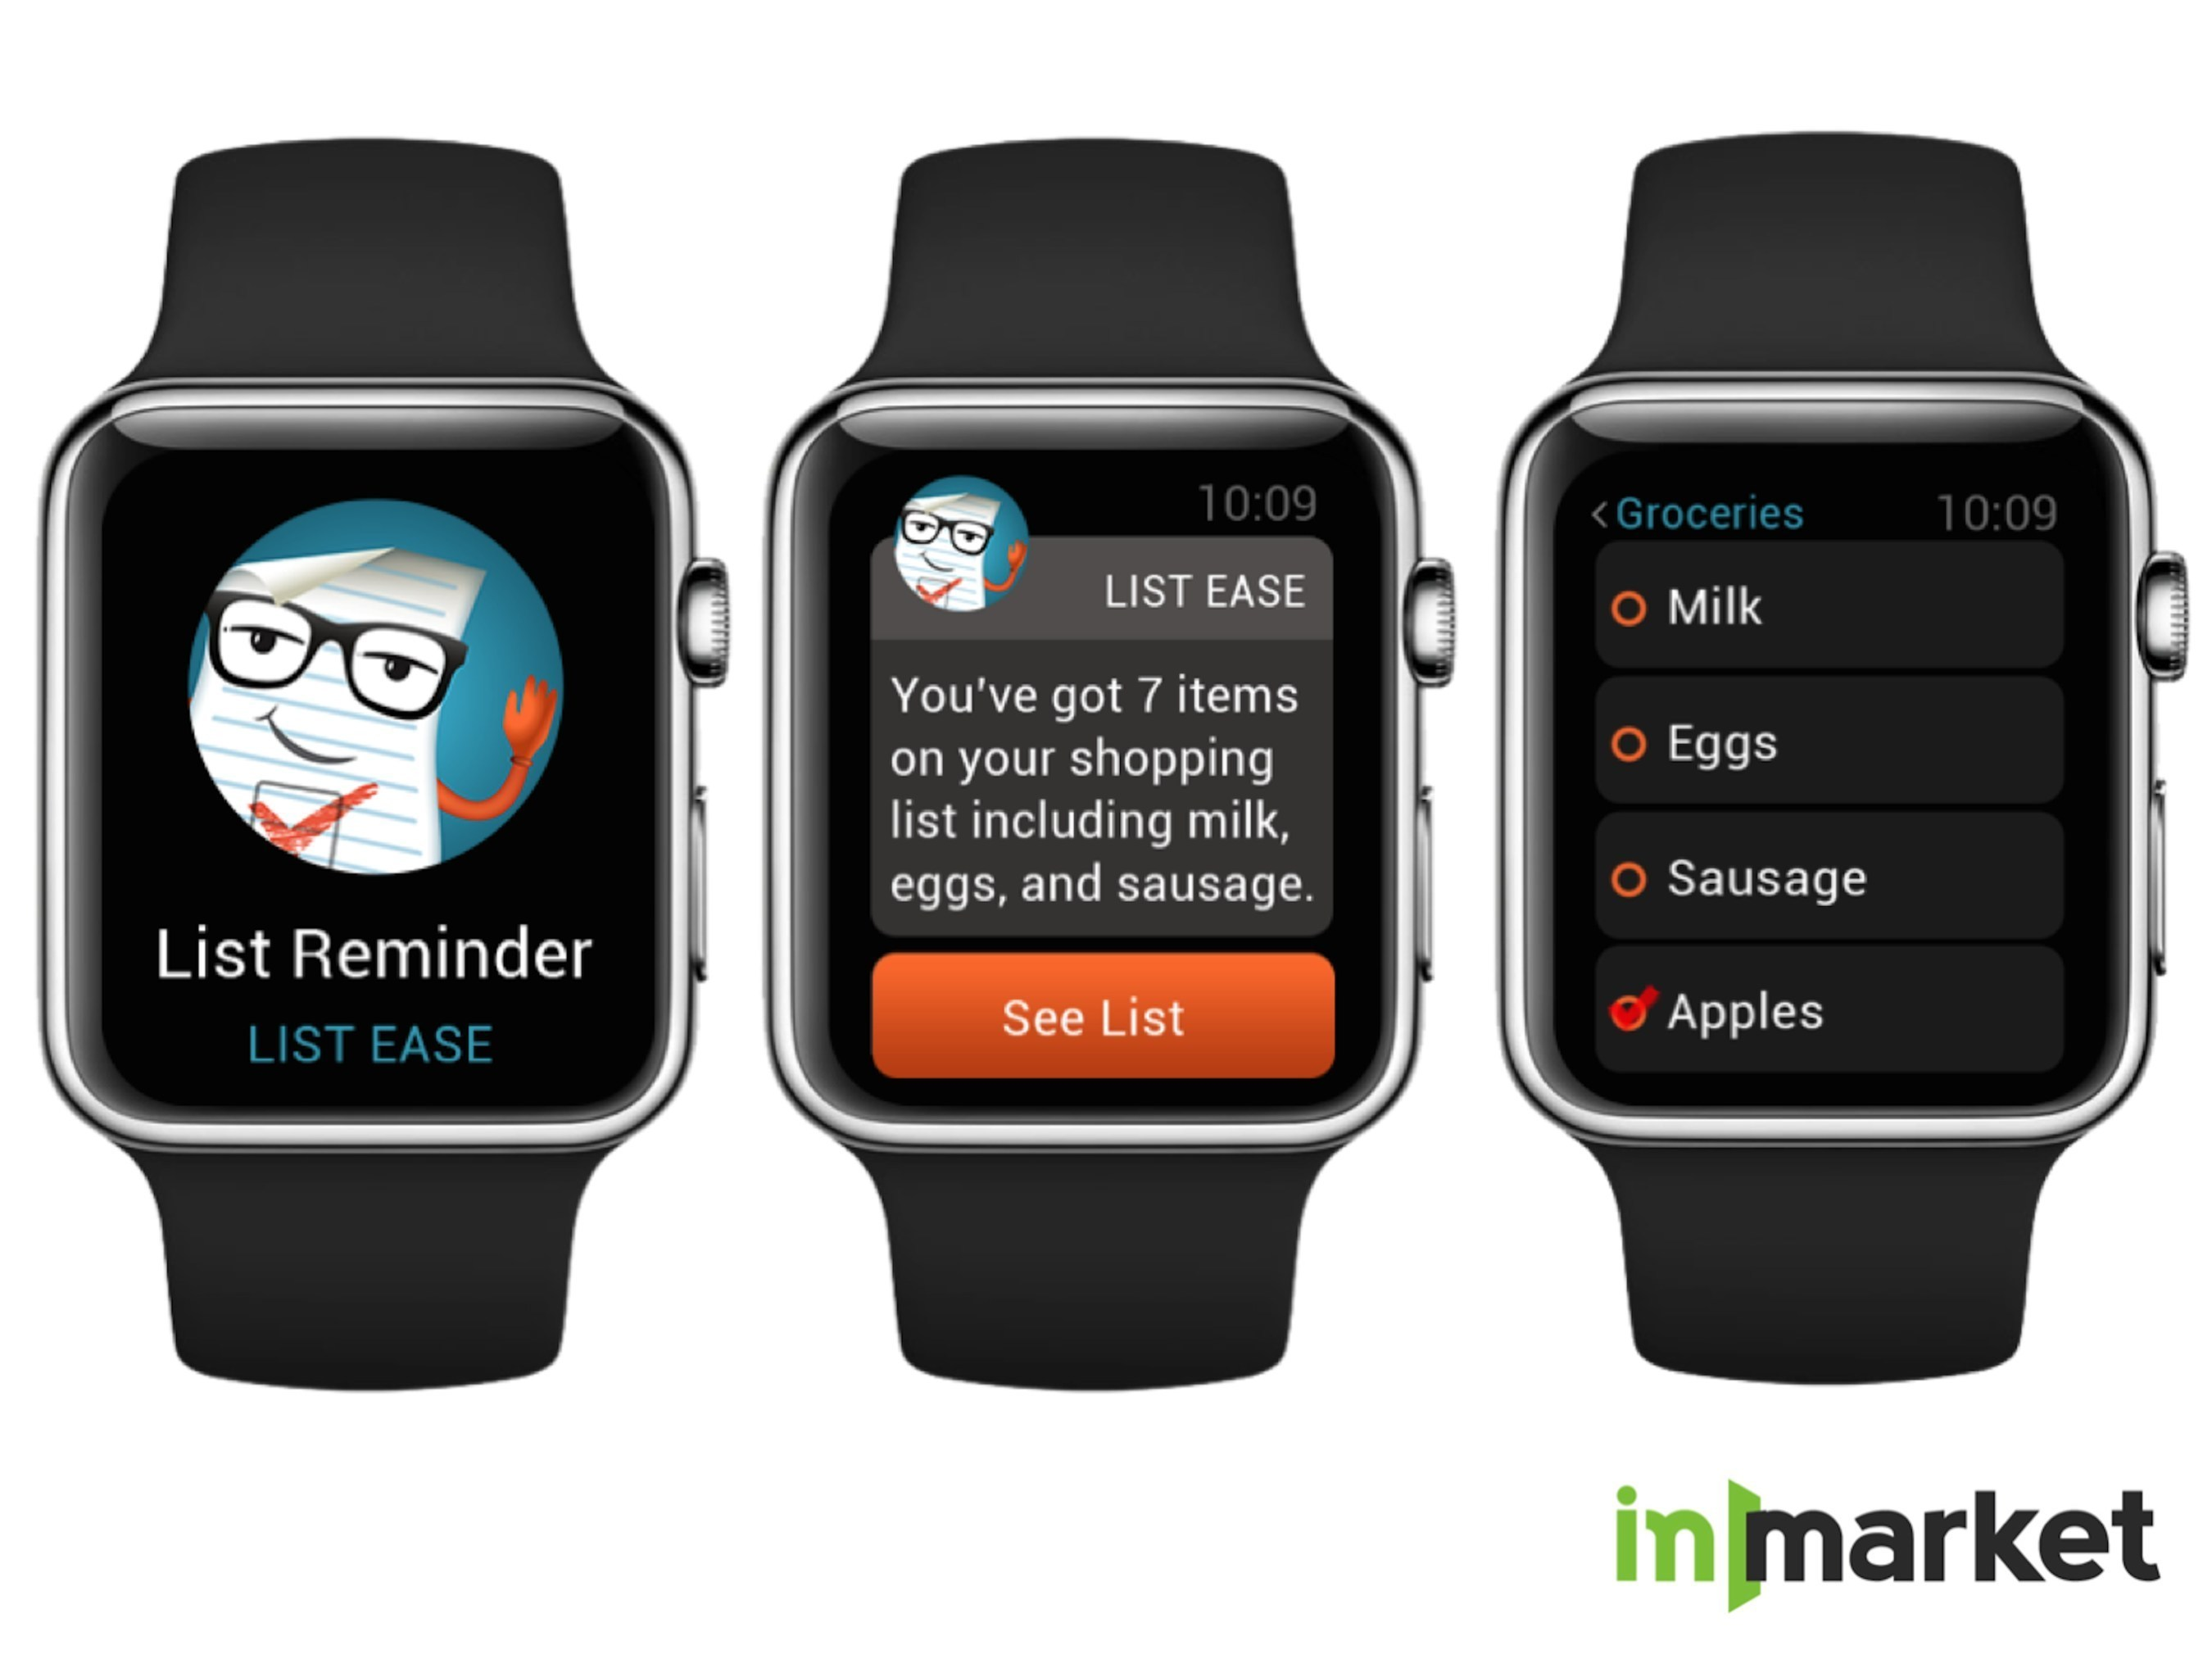 inMarket - Apple Watch User Experience in List Ease